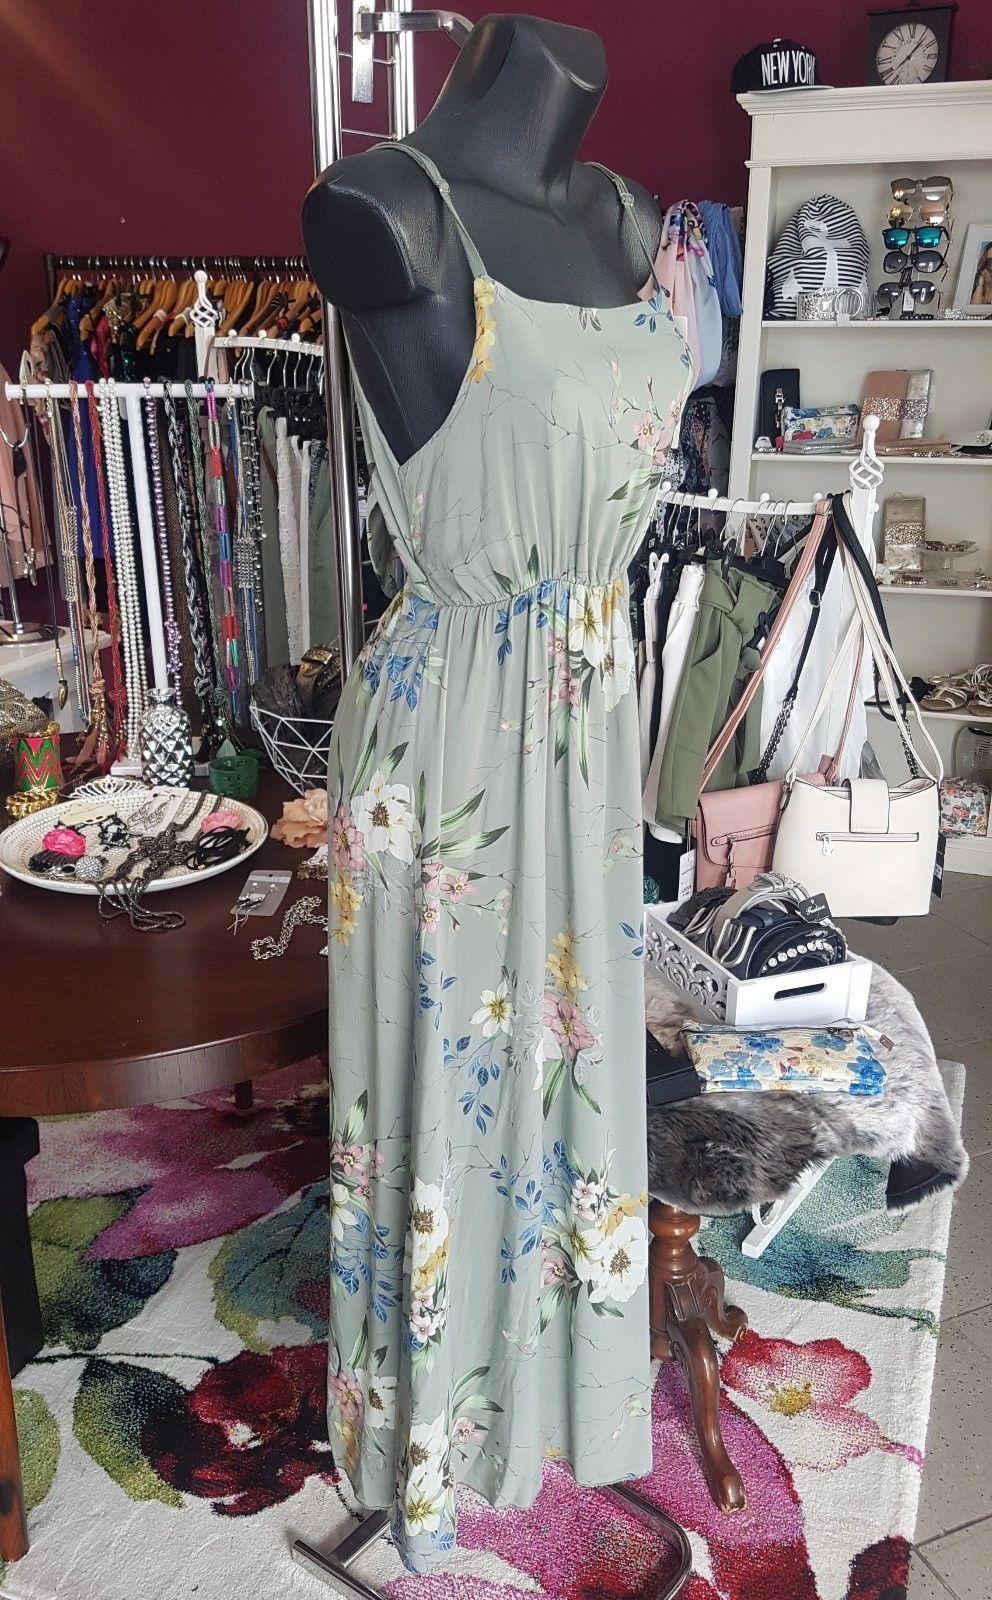 Maxi Sommer Boho Hippie Kleid Geblümt Lang Blüten Kleid Gr S Weiß